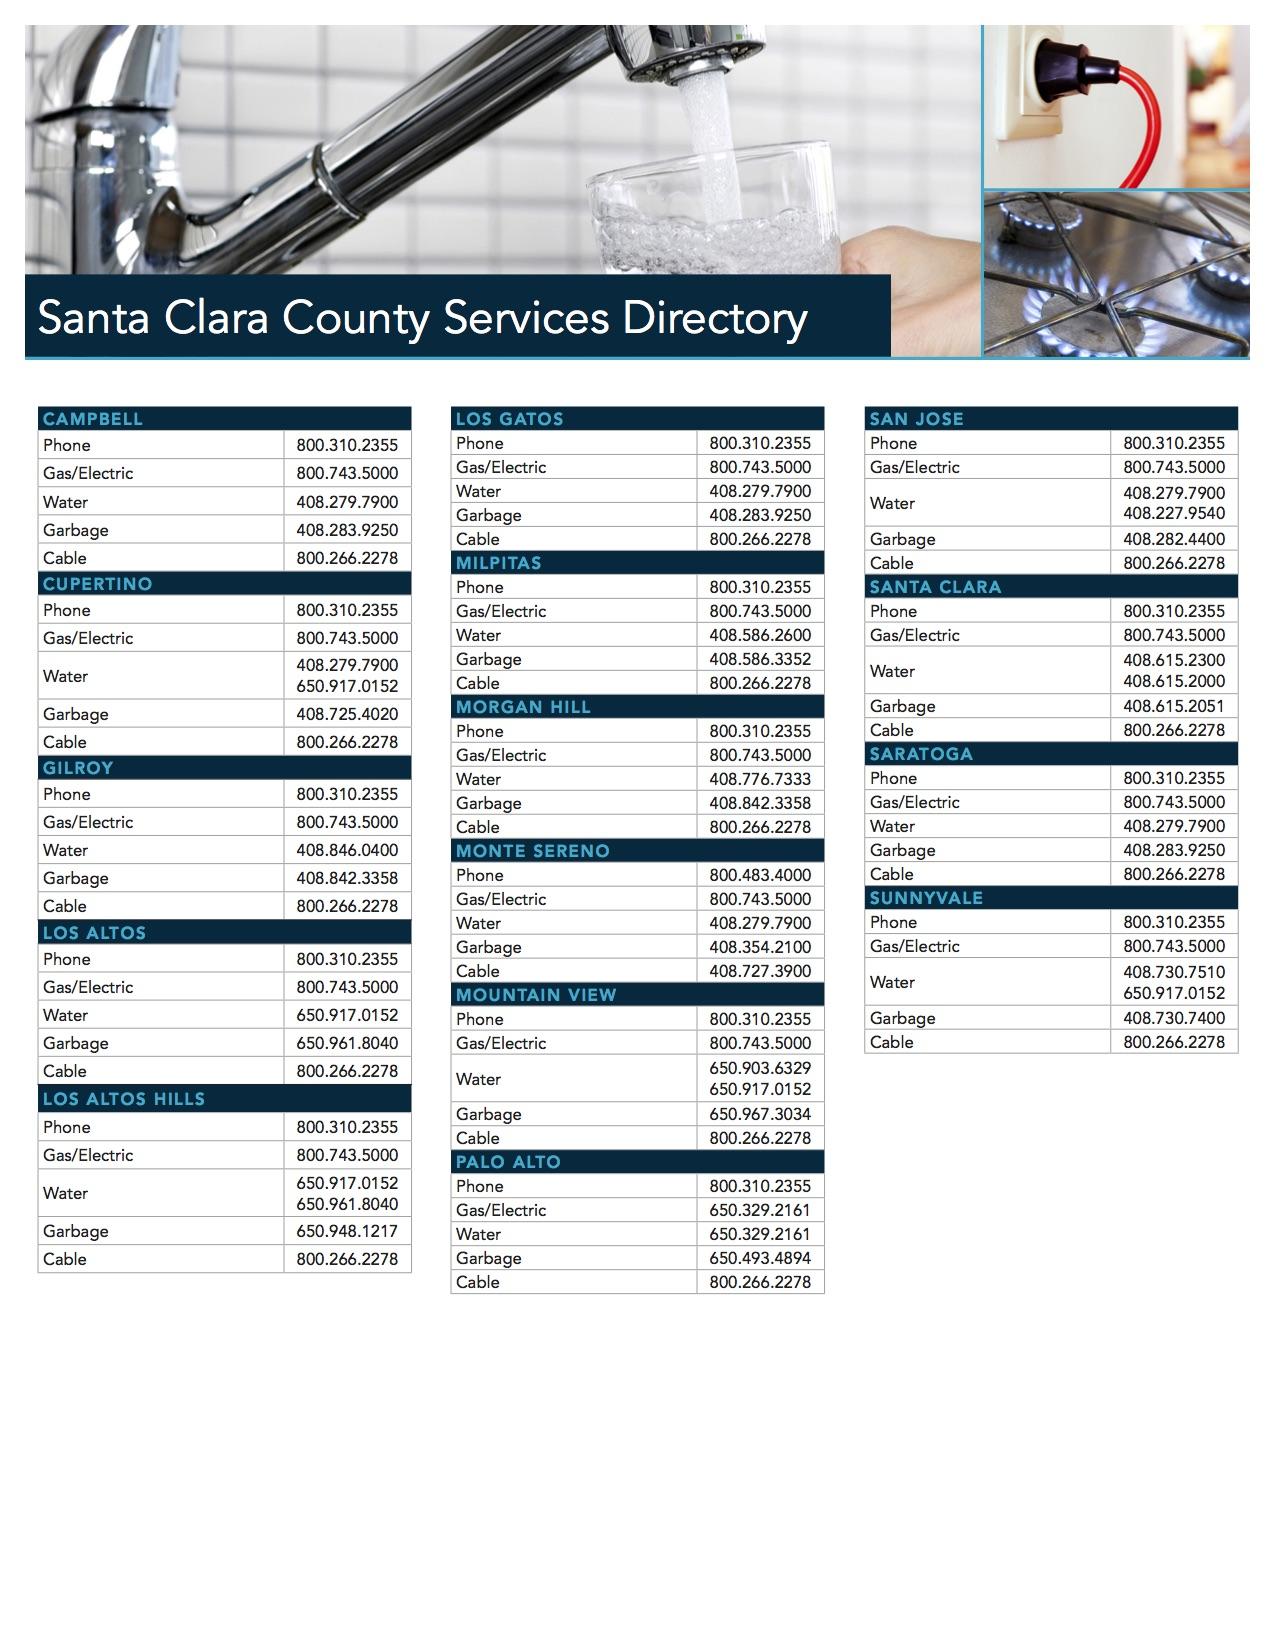 Santa Clara County_Utilities (1)